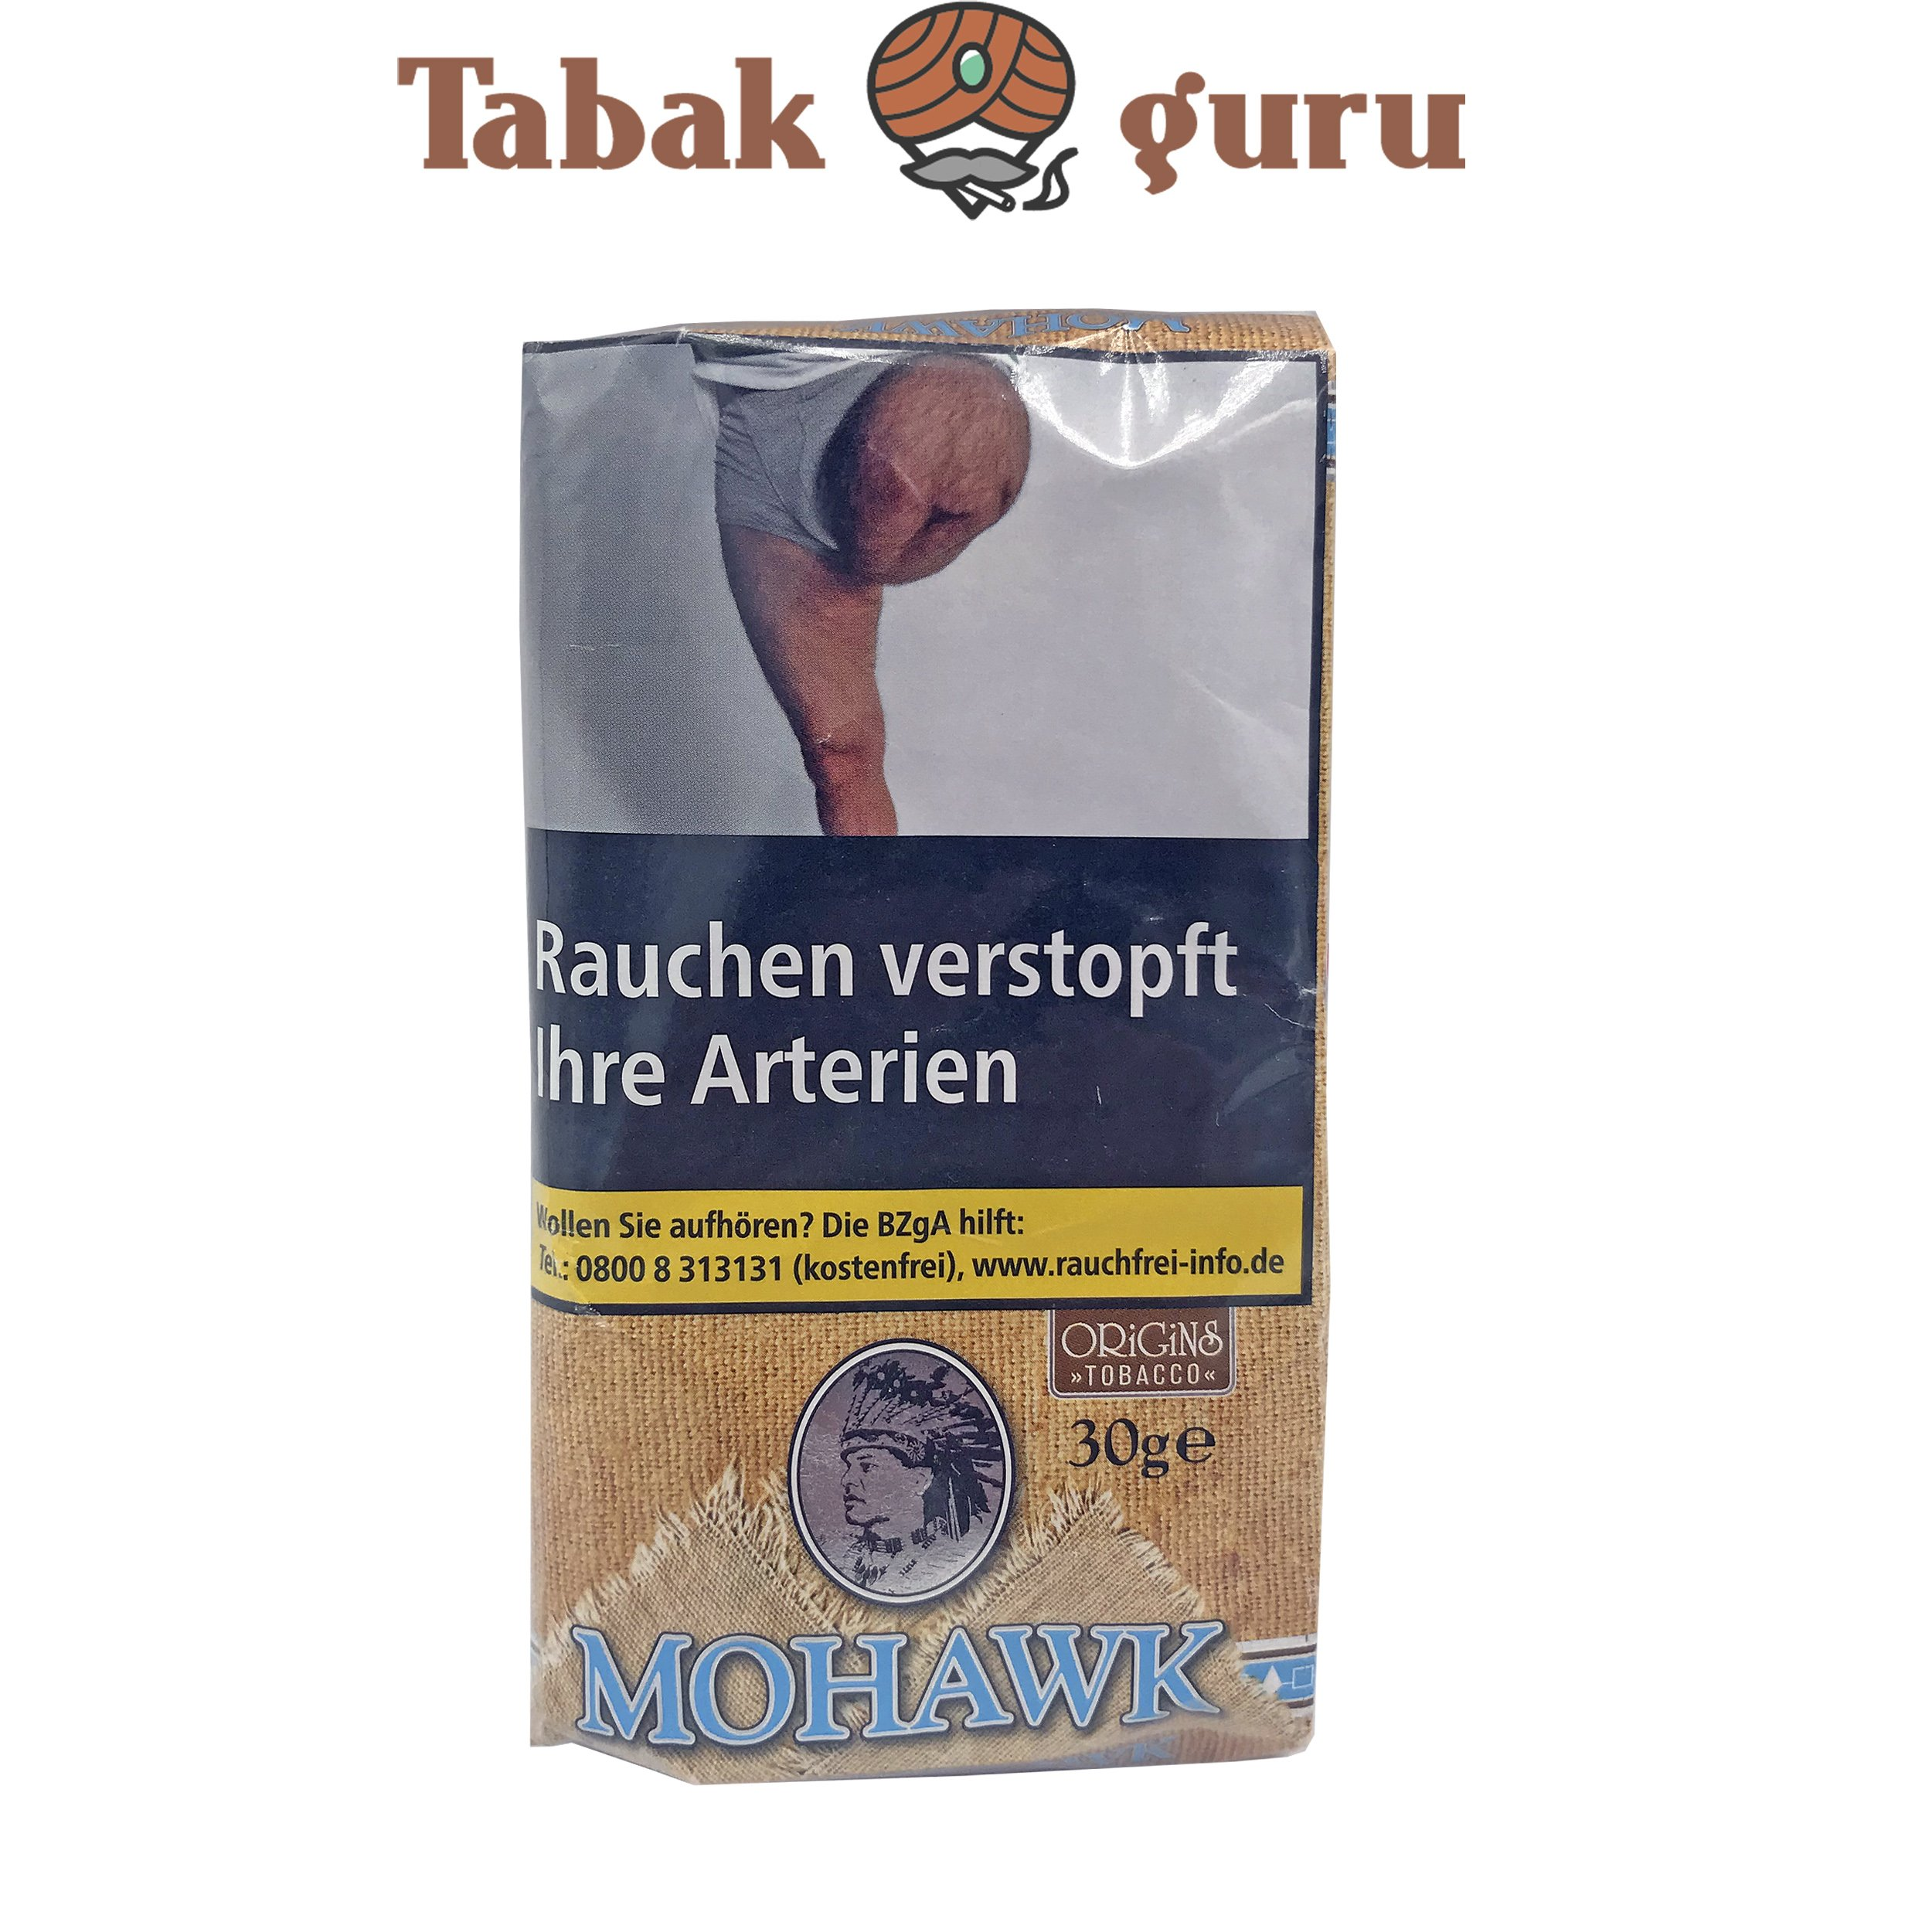 Mohawk Origins Tobacco 30g Drehtabak Zigarettentabak